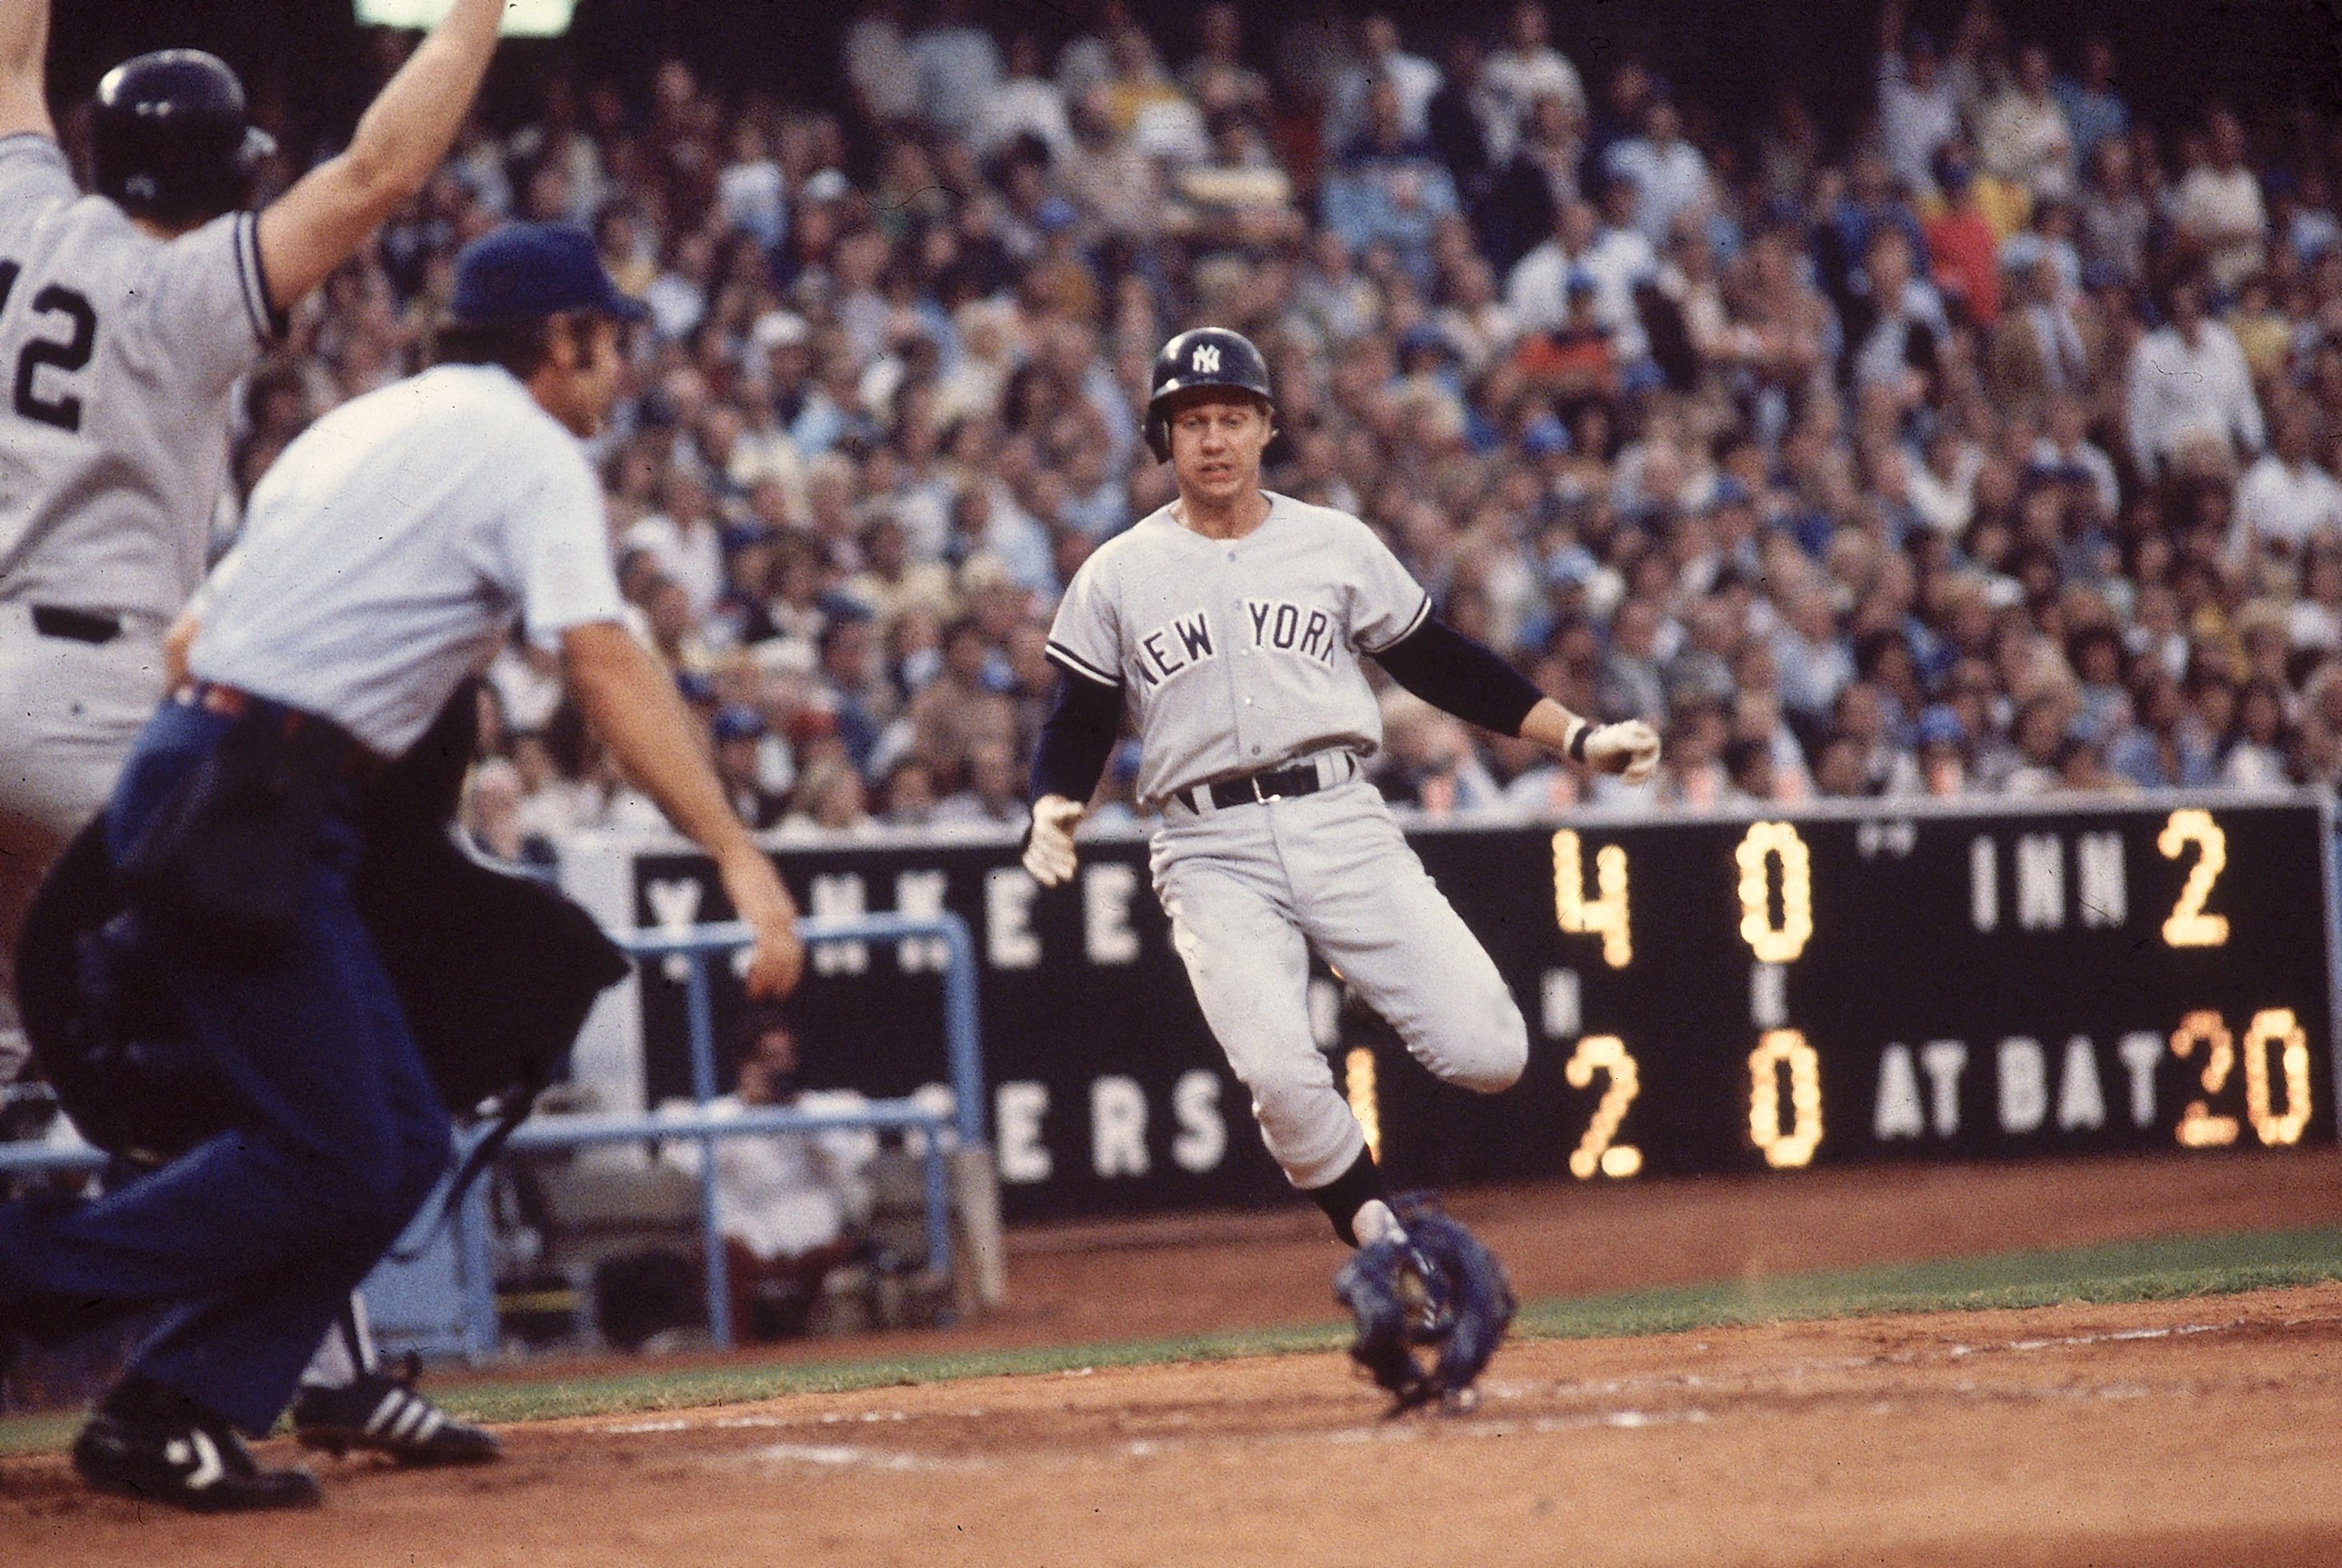 Los Angeles Dodgers vs New York Yankees, 1978 World Series